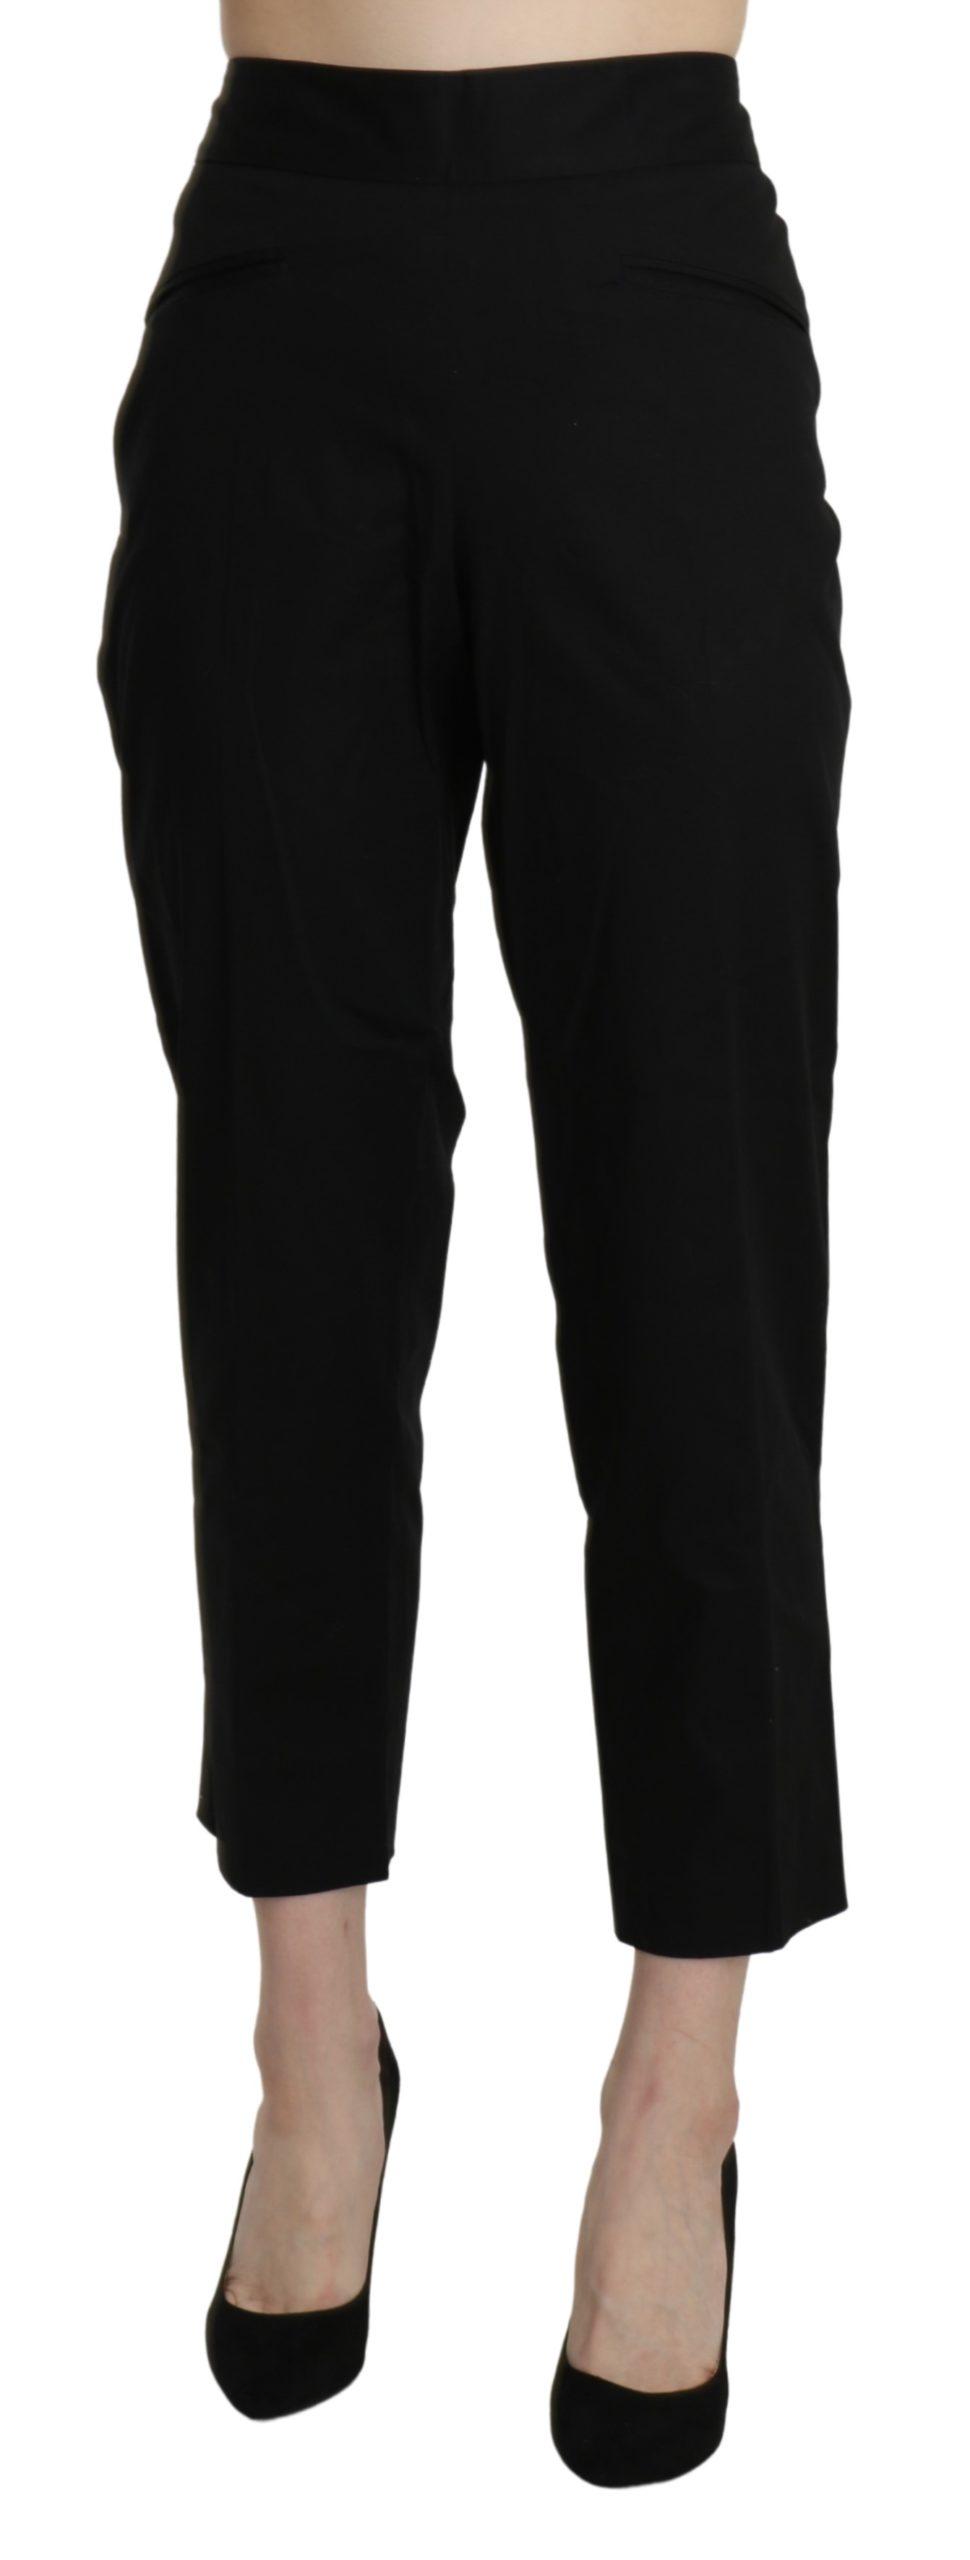 BENCIVENGA Women's High Waist Straight Cropped Trousers Black PAN71323-44 - IT44 L